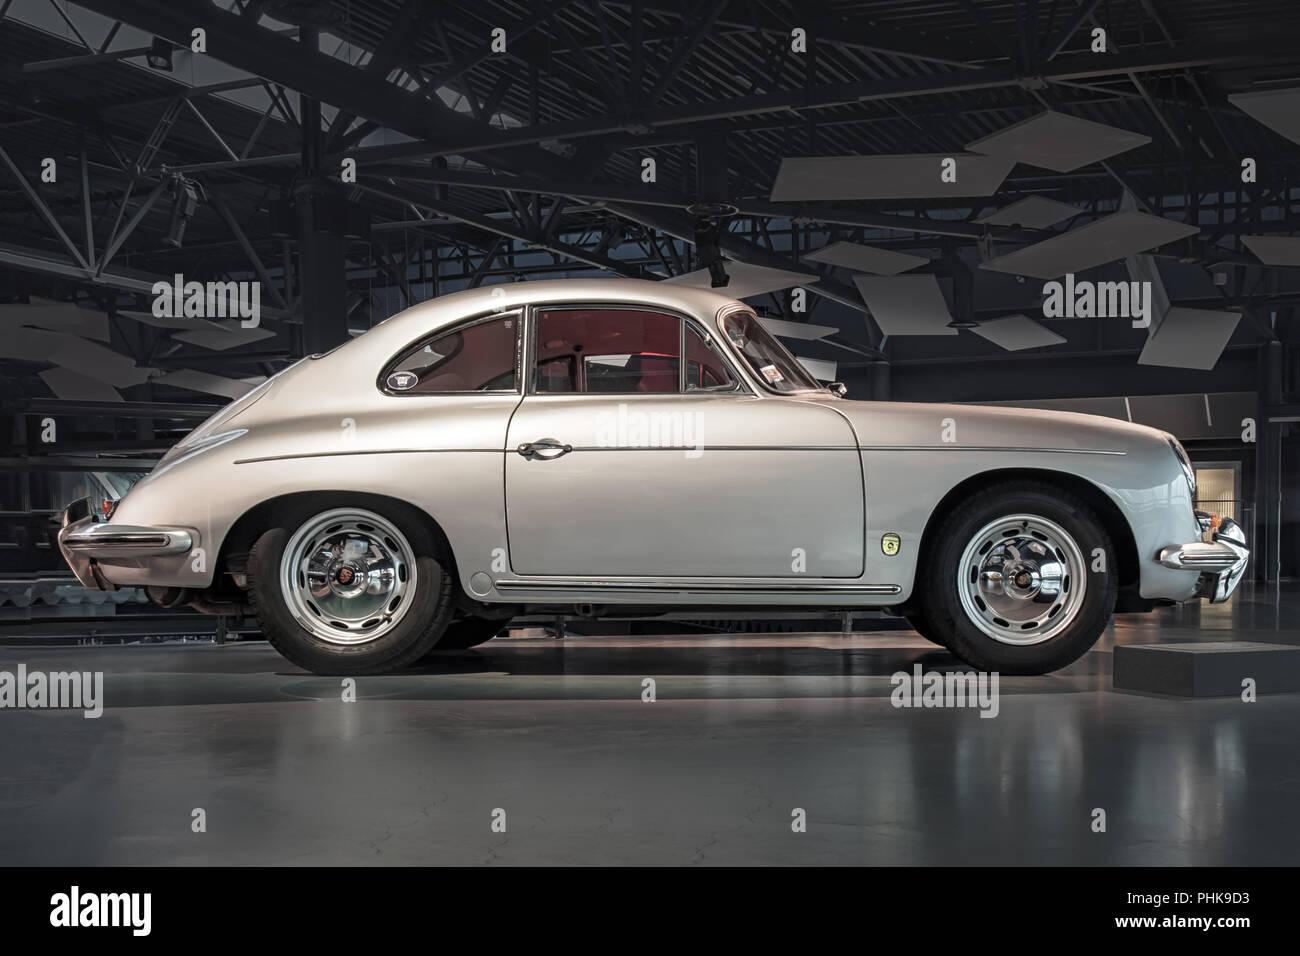 RIGA, LATVIA-APRIL 18, 2018: 1961 Porsche 356 B in the Riga Motor Museum. - Stock Image